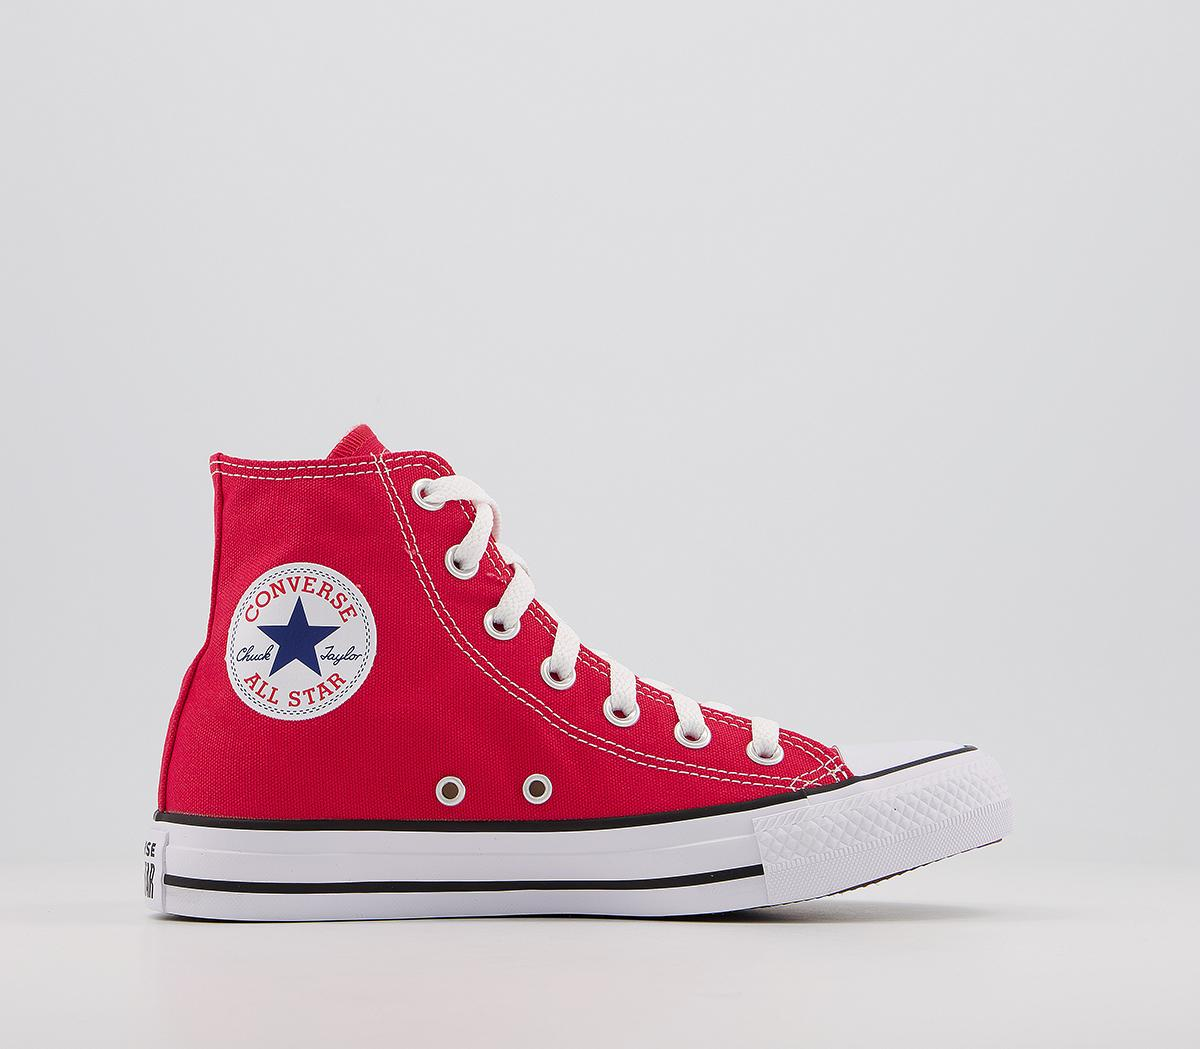 Converse All Star Hi Red Canvas